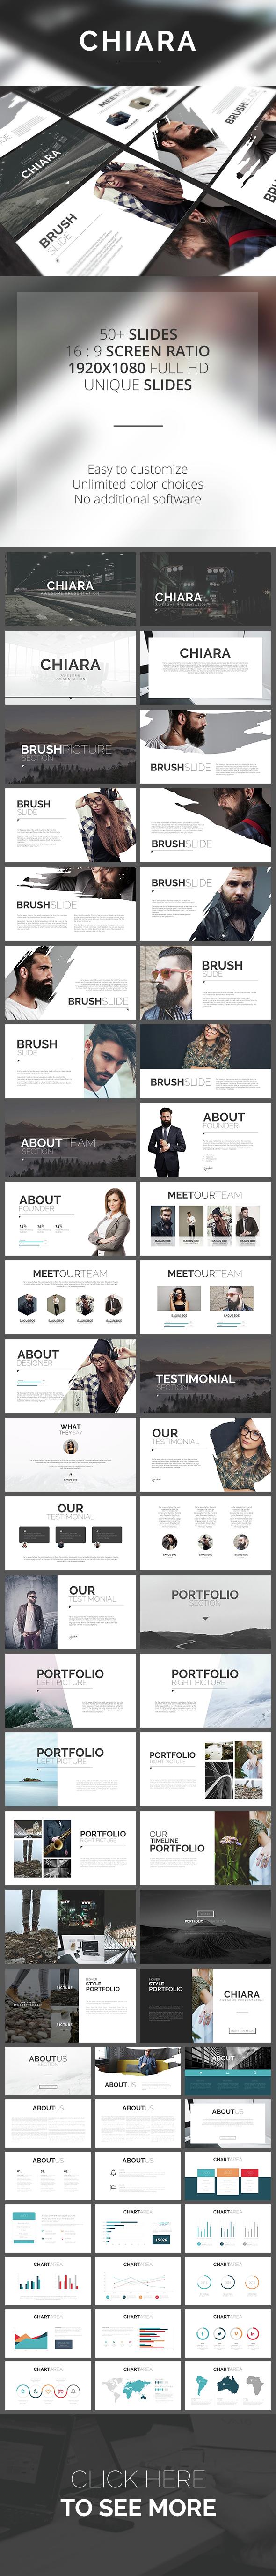 Chiara PowerPoint Template - PowerPoint Templates Presentation Templates